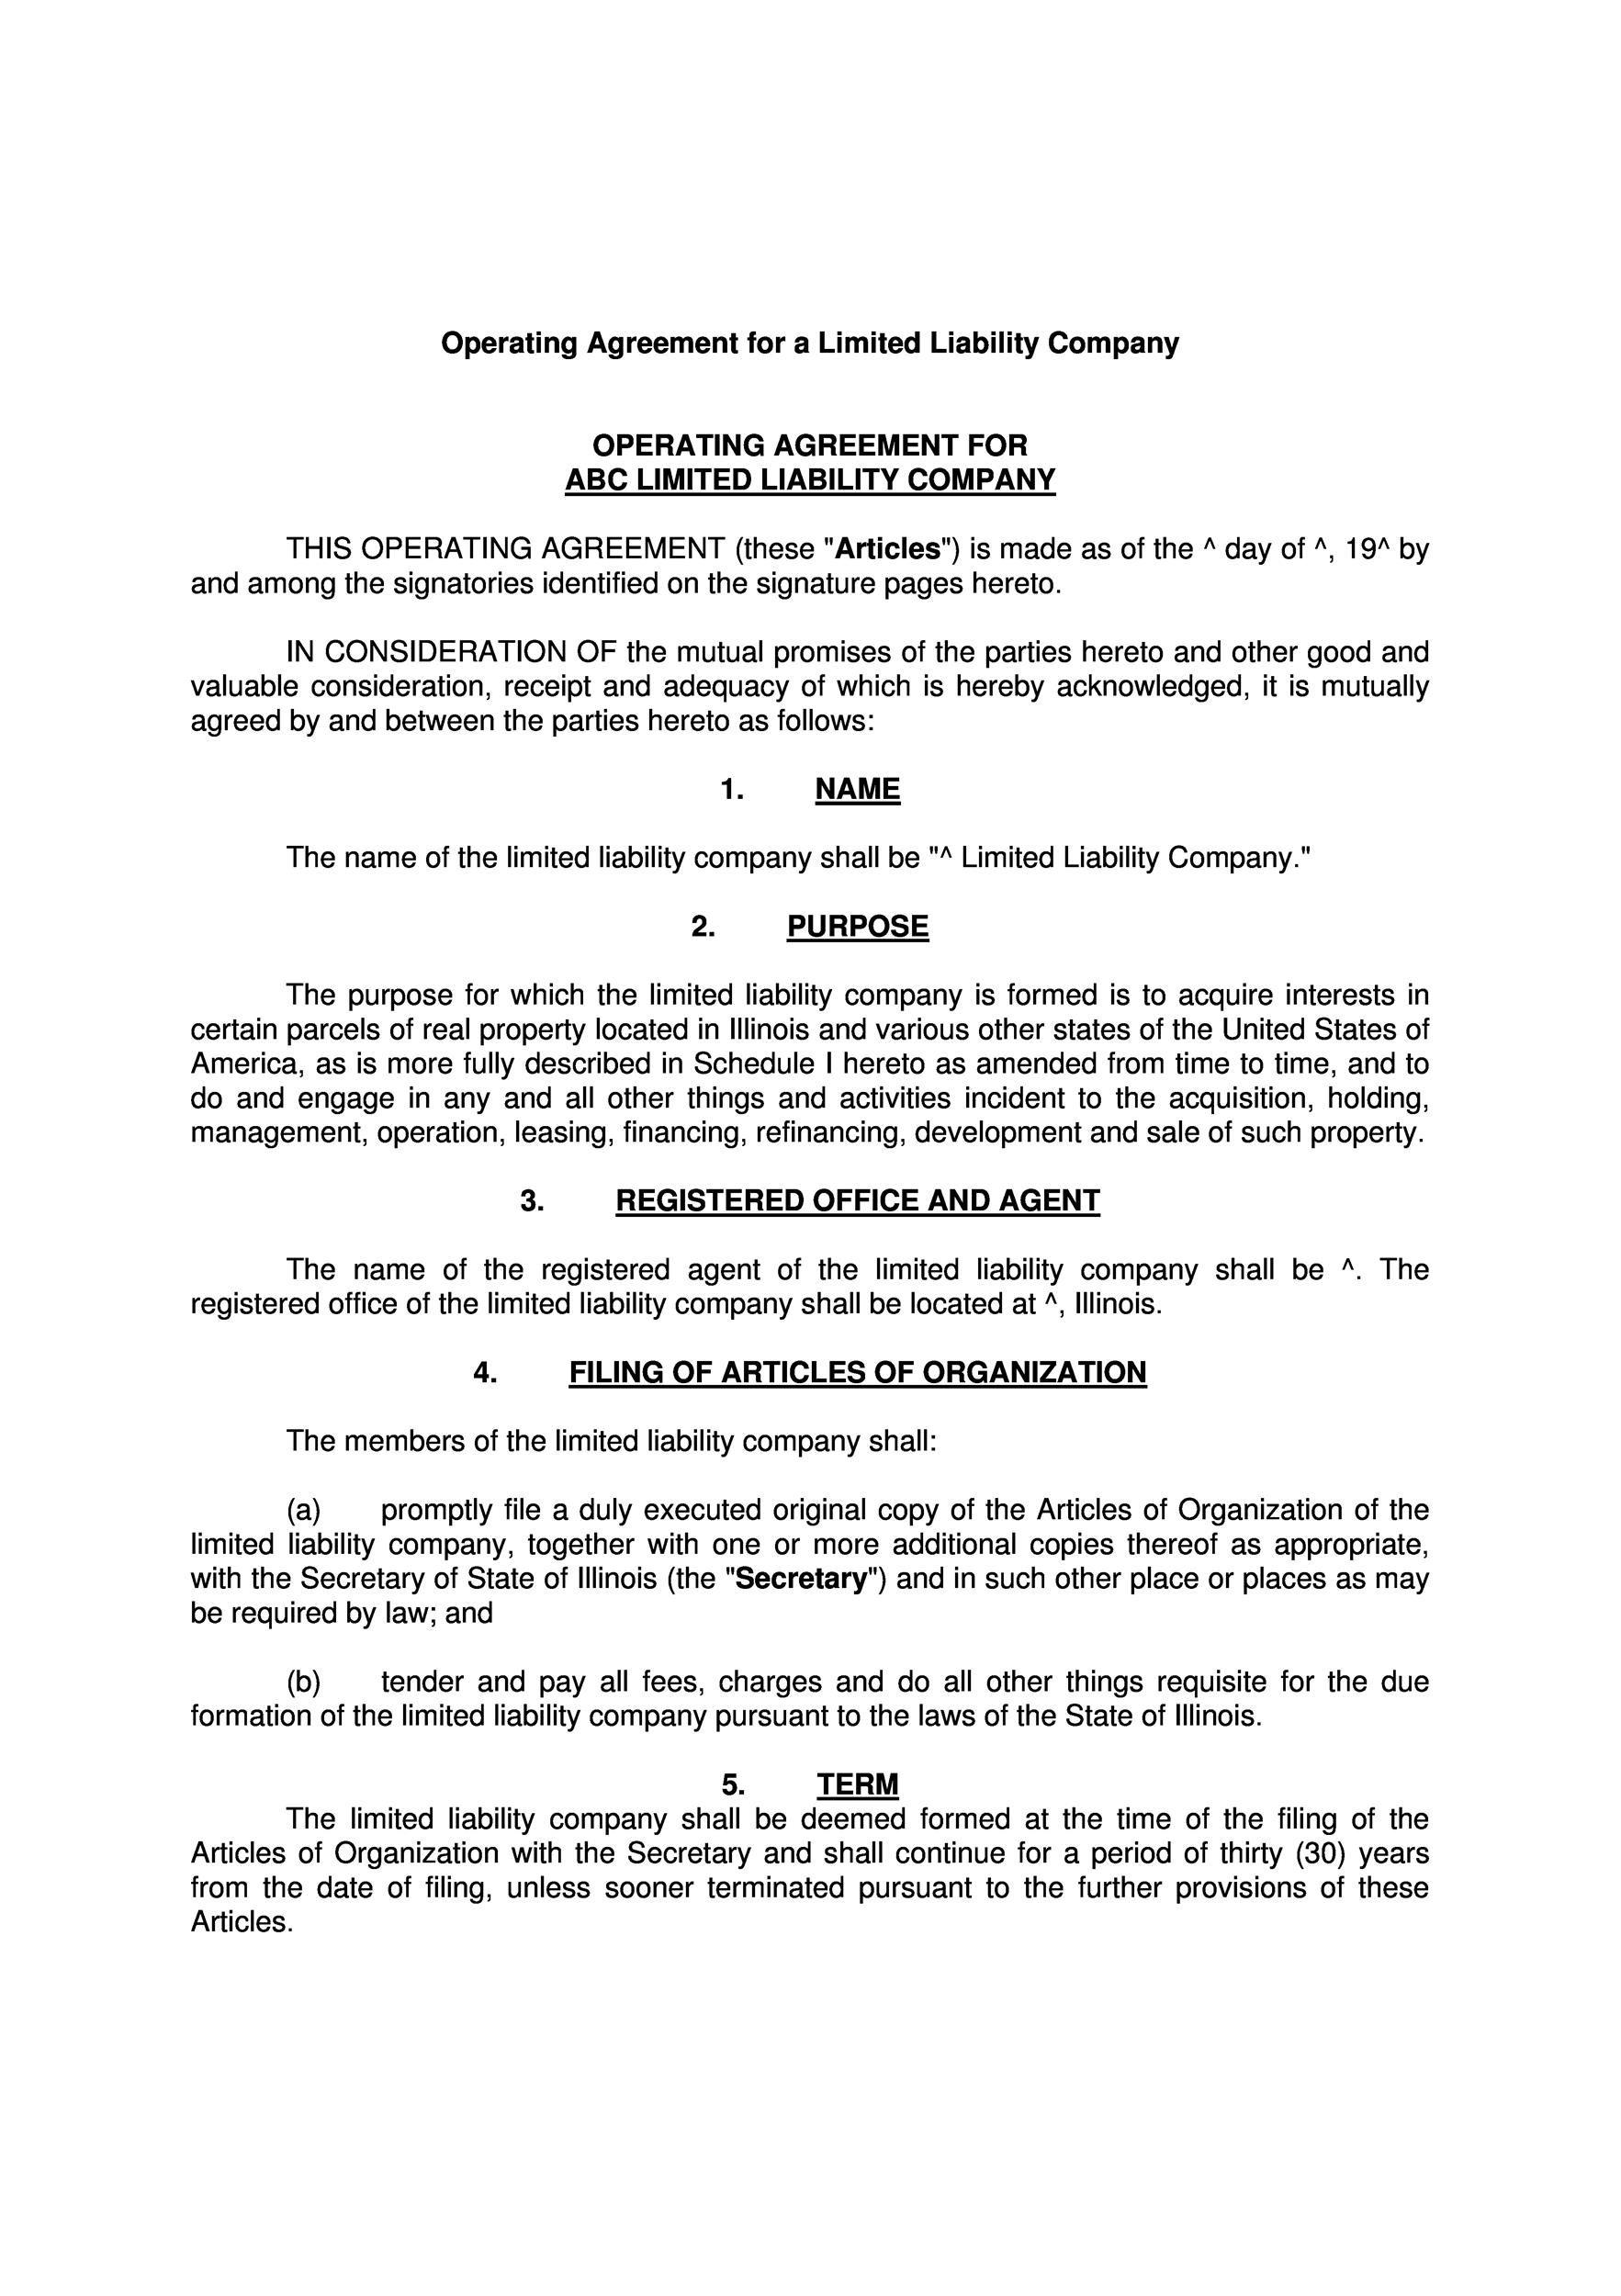 005 Breathtaking Free Operating Agreement Template Image  Pdf Missouri LlcFull